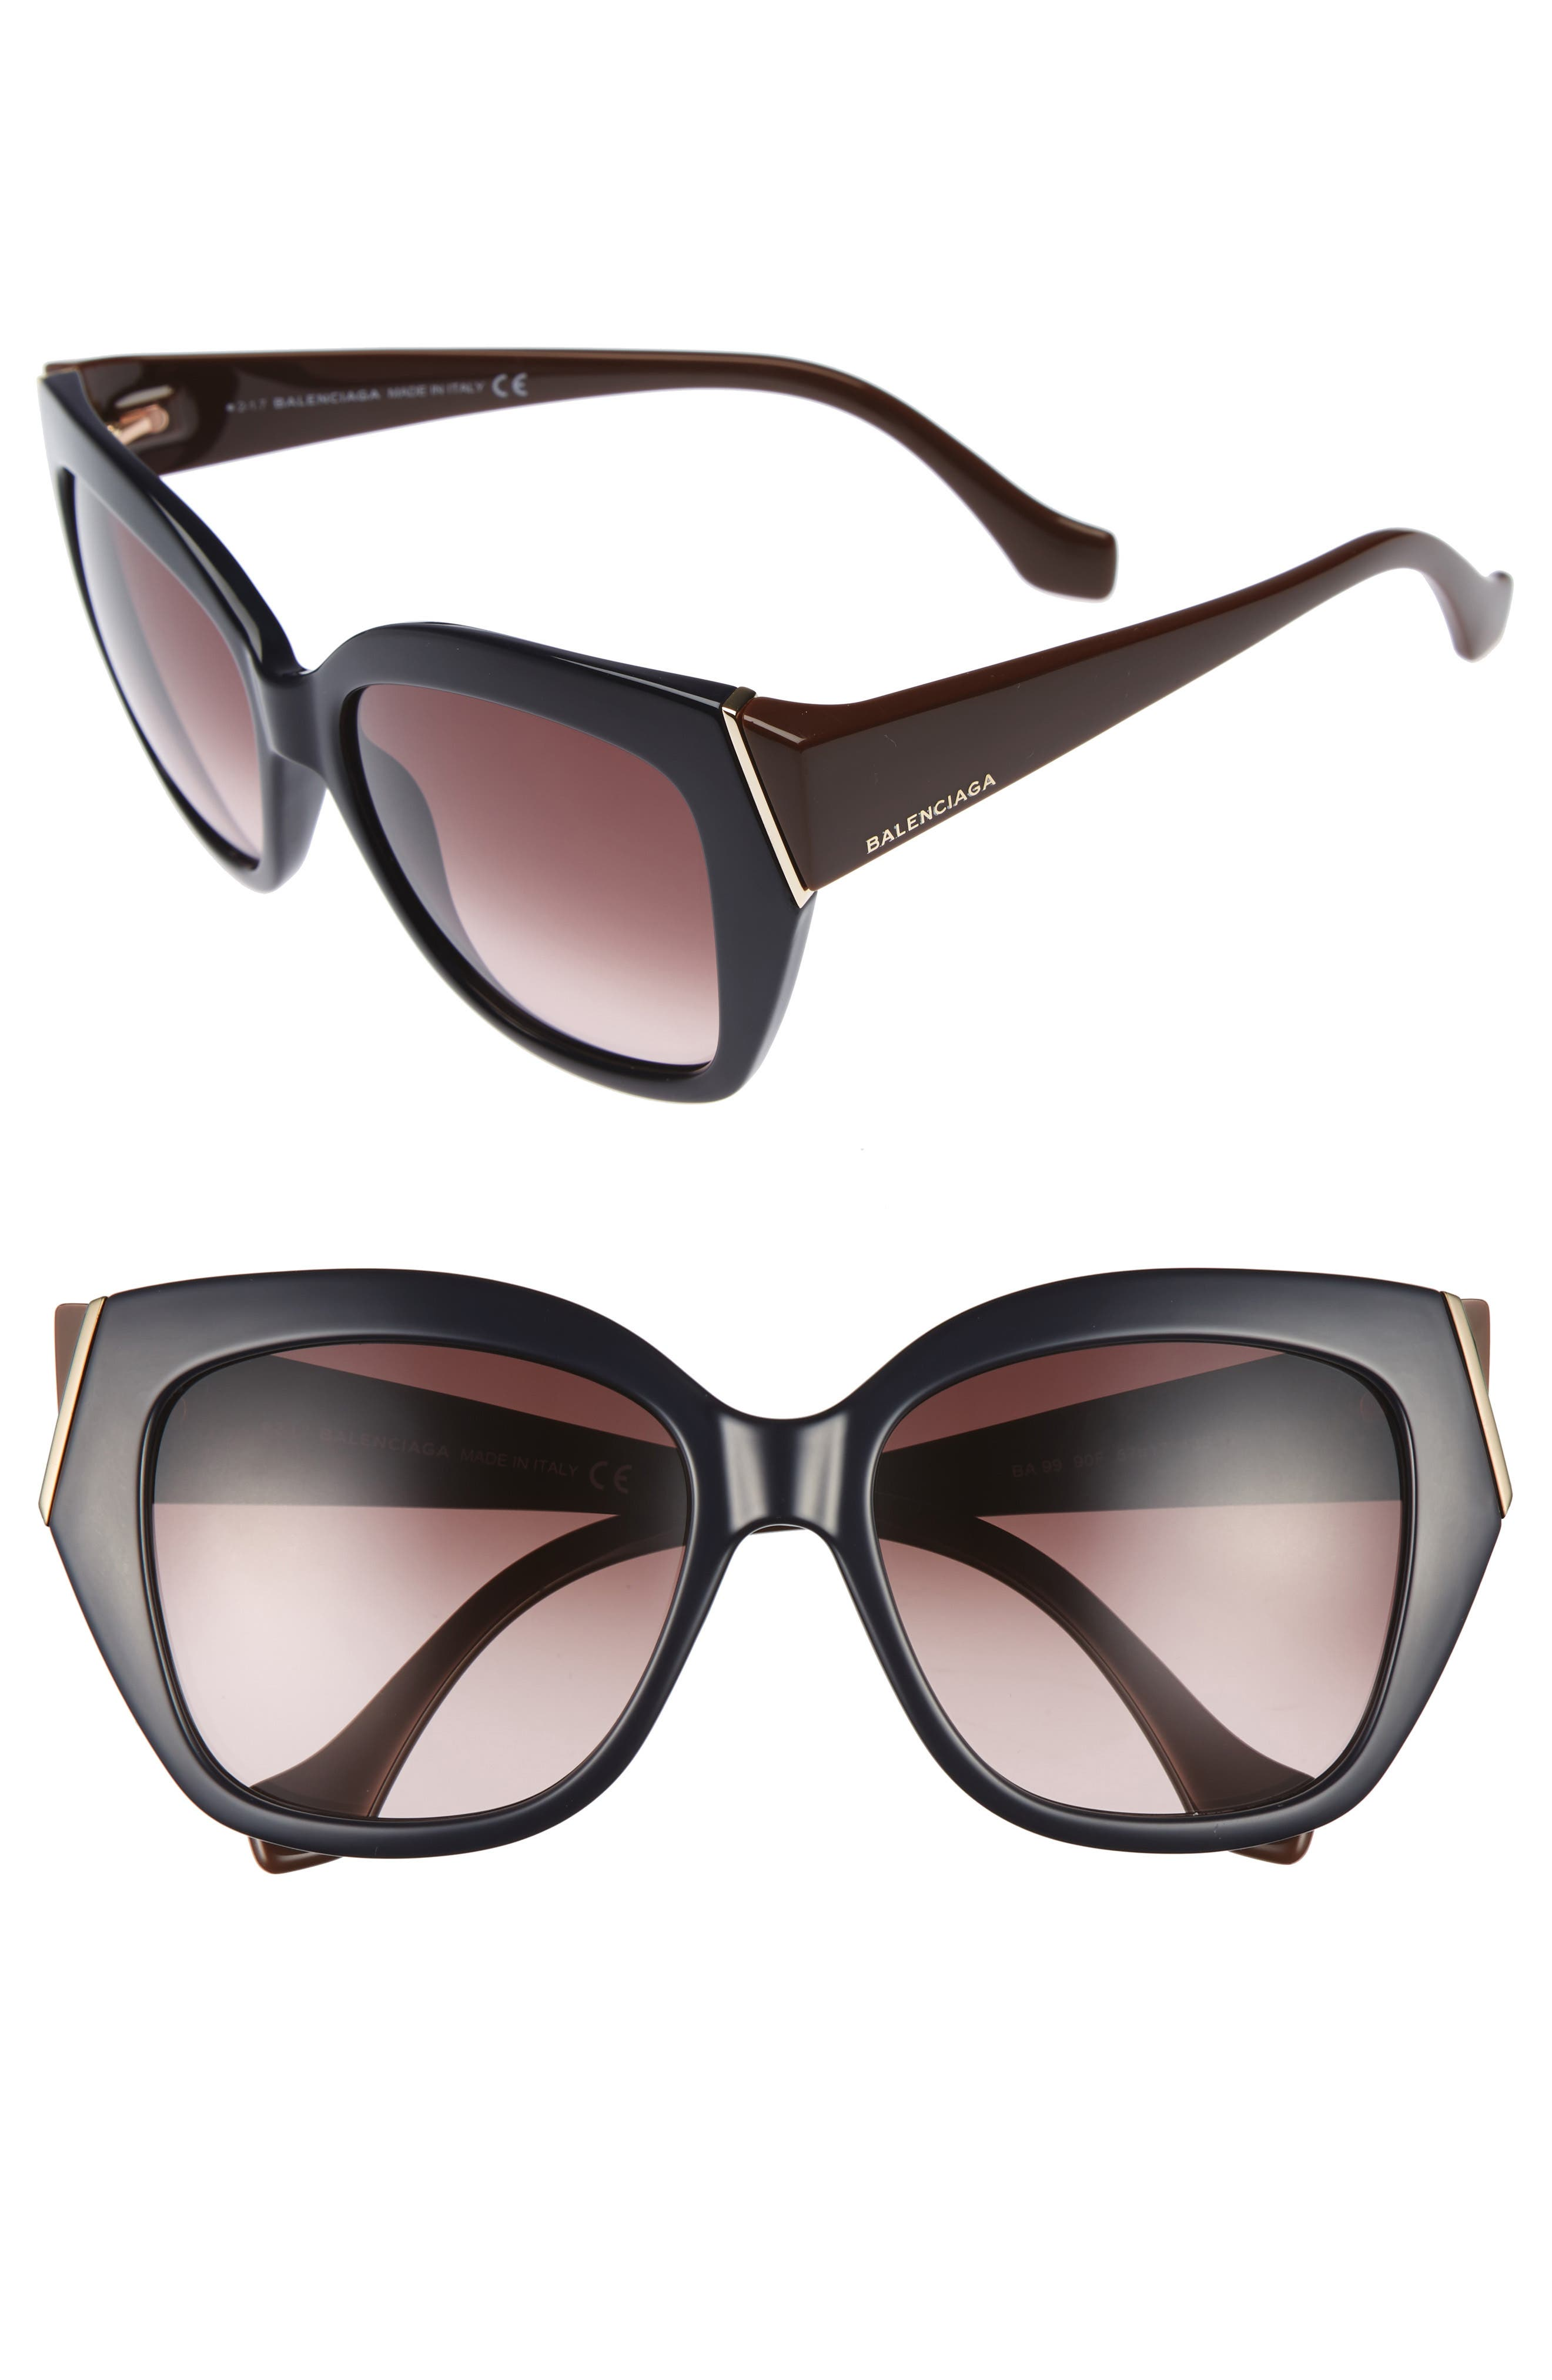 57mm Cat Eye Sunglasses,                         Main,                         color, Shiny Blue/ Gradient Brown